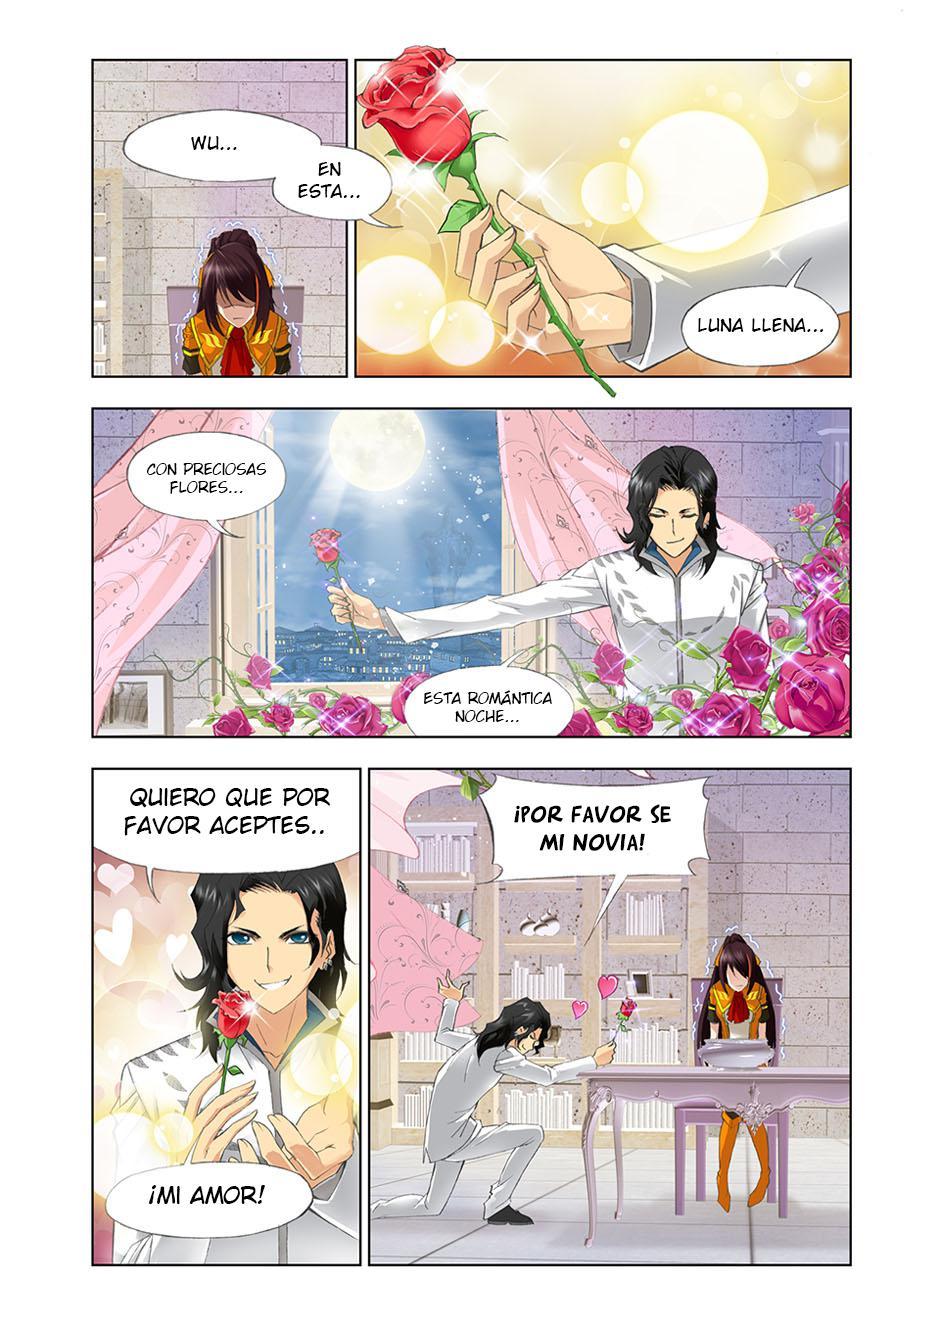 http://c5.ninemanga.com/es_manga/18/16210/417363/84ecc6b400aa7edb60770f7baa73abd1.jpg Page 10